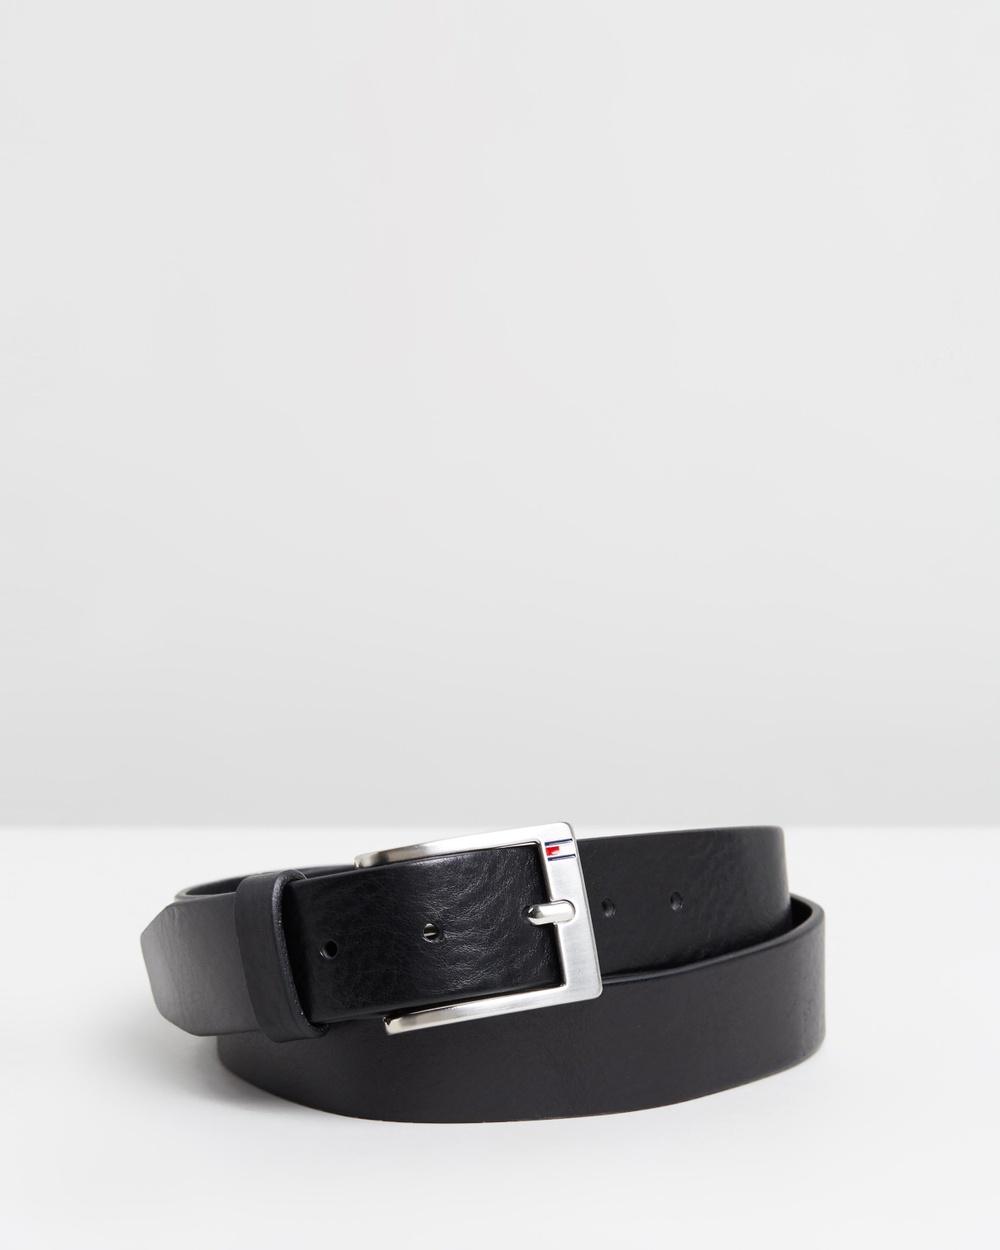 Tommy Hilfiger New Aly Belt Belts Black